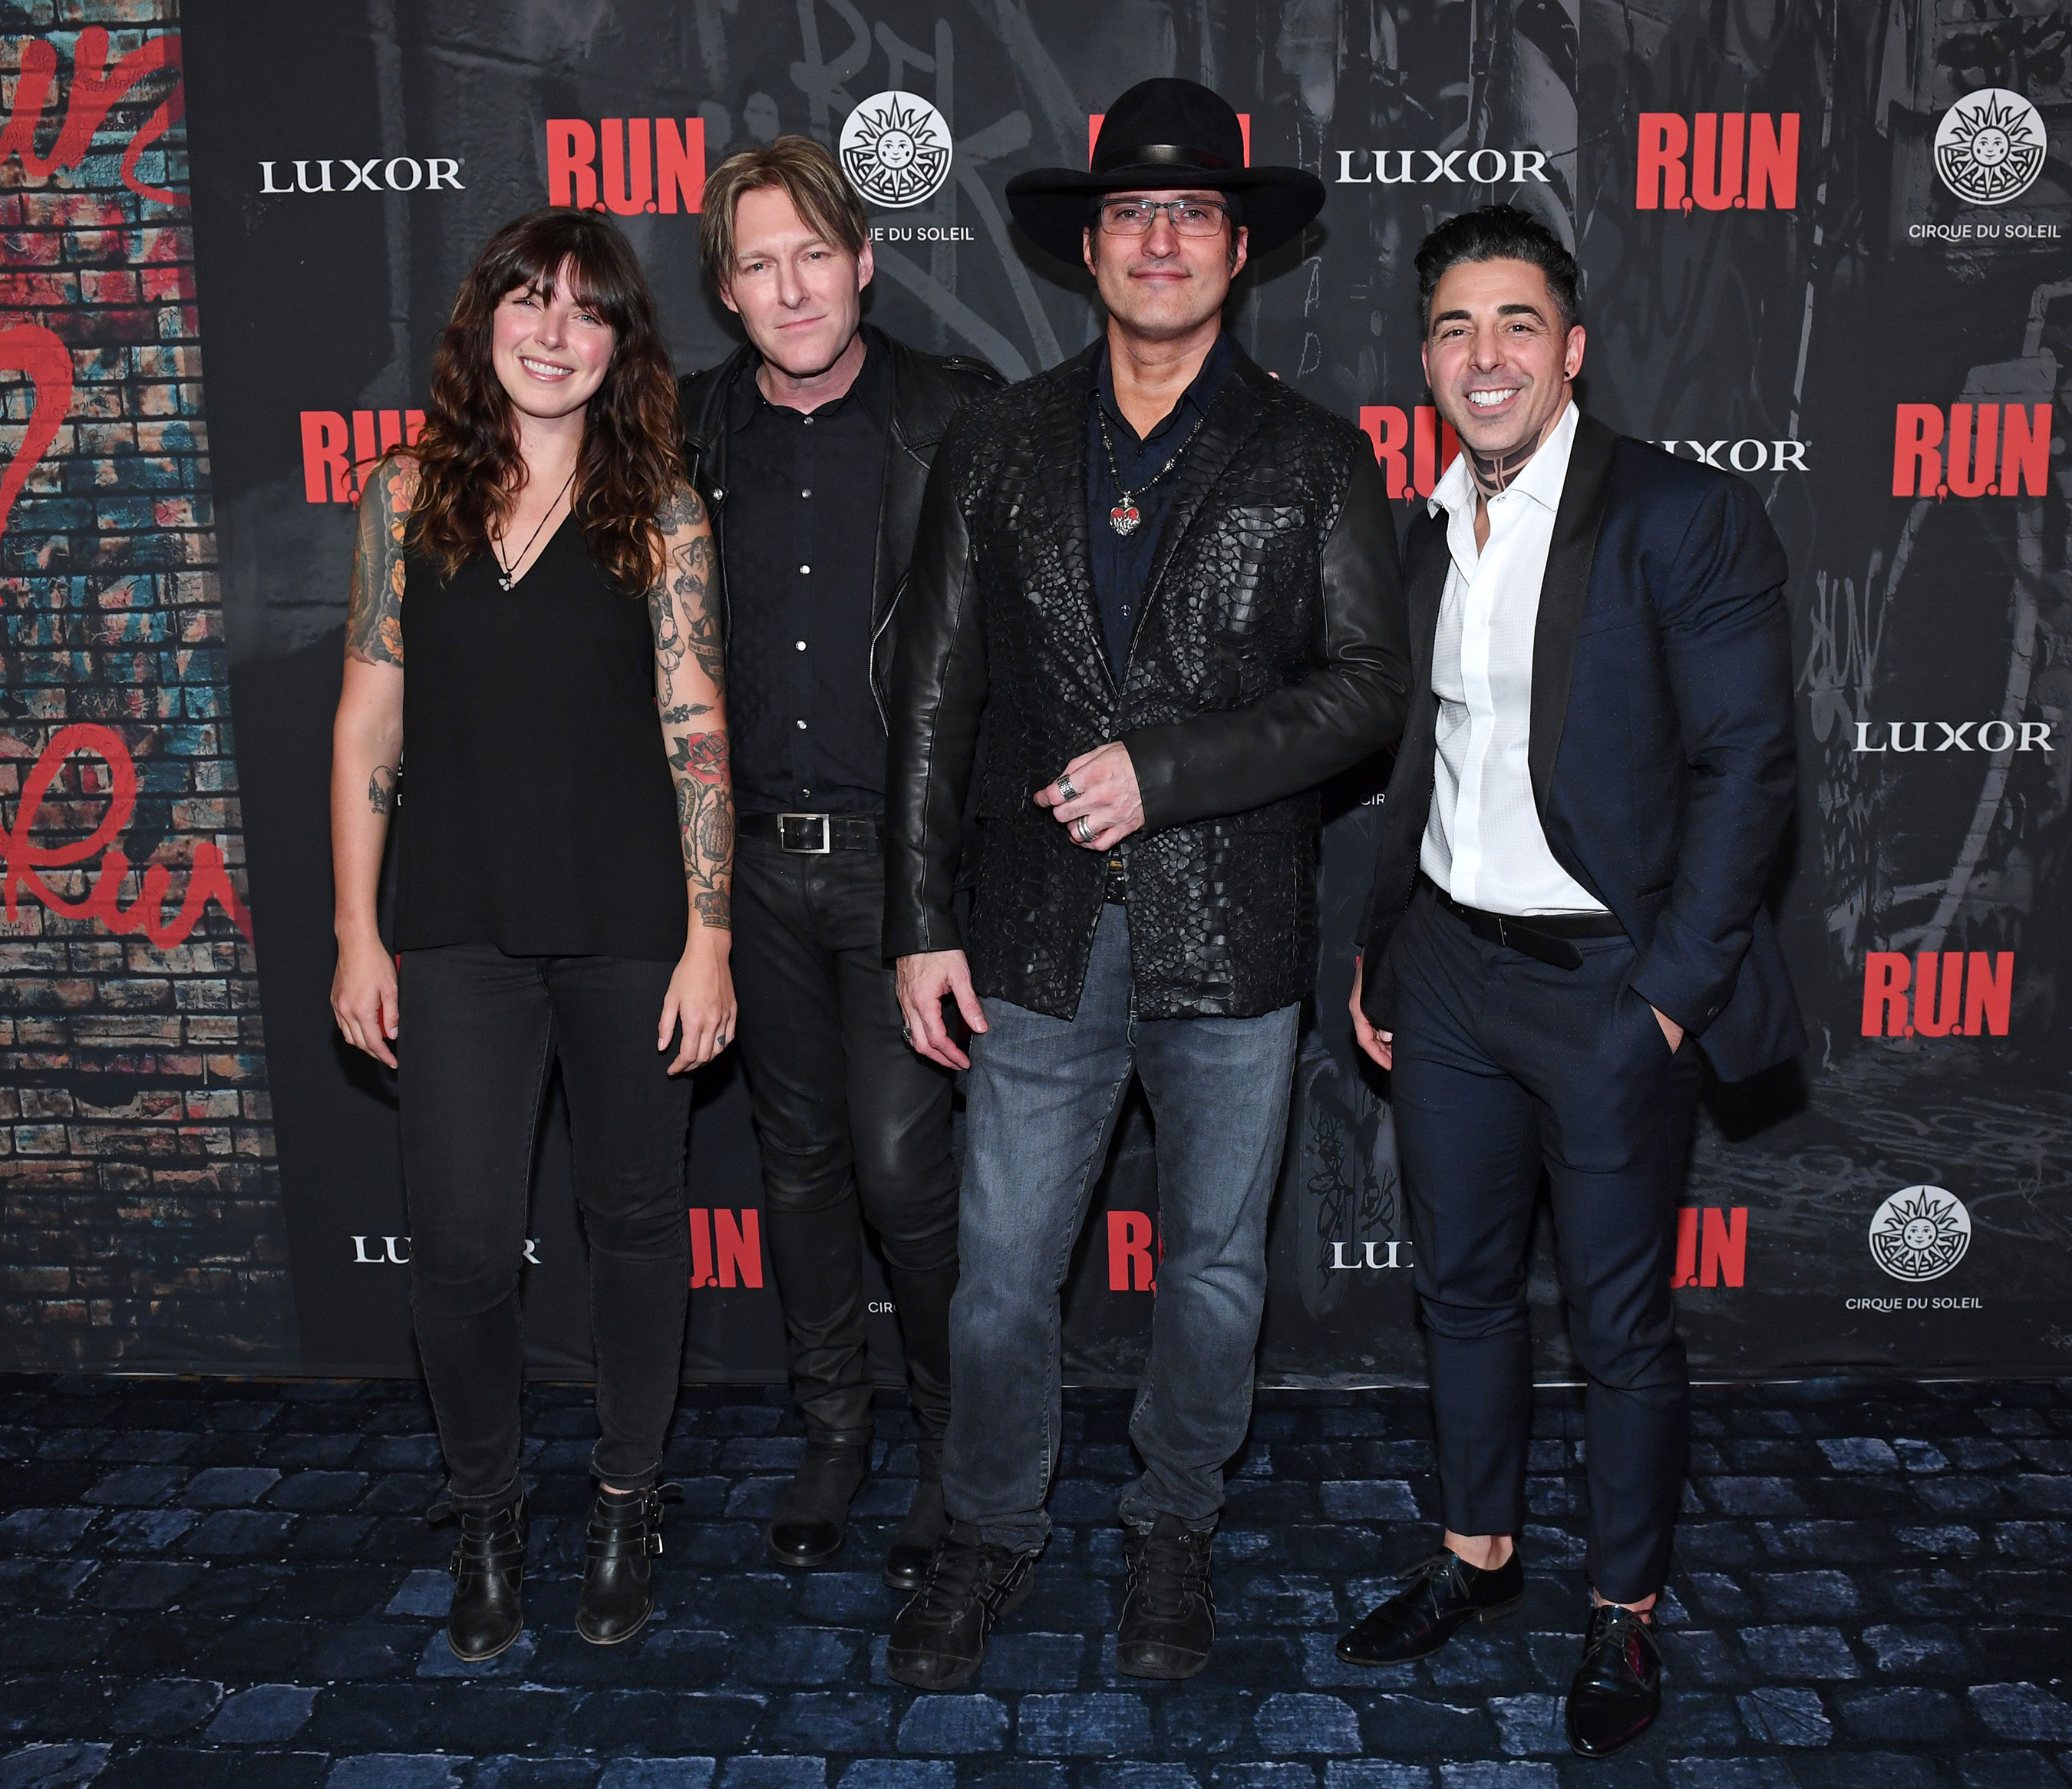 (L-R), Alexis Krauss, Tyler Bates, Robert Rodriguez and Michael Schwandt at World Premiere of R.U.N, Nov. 14